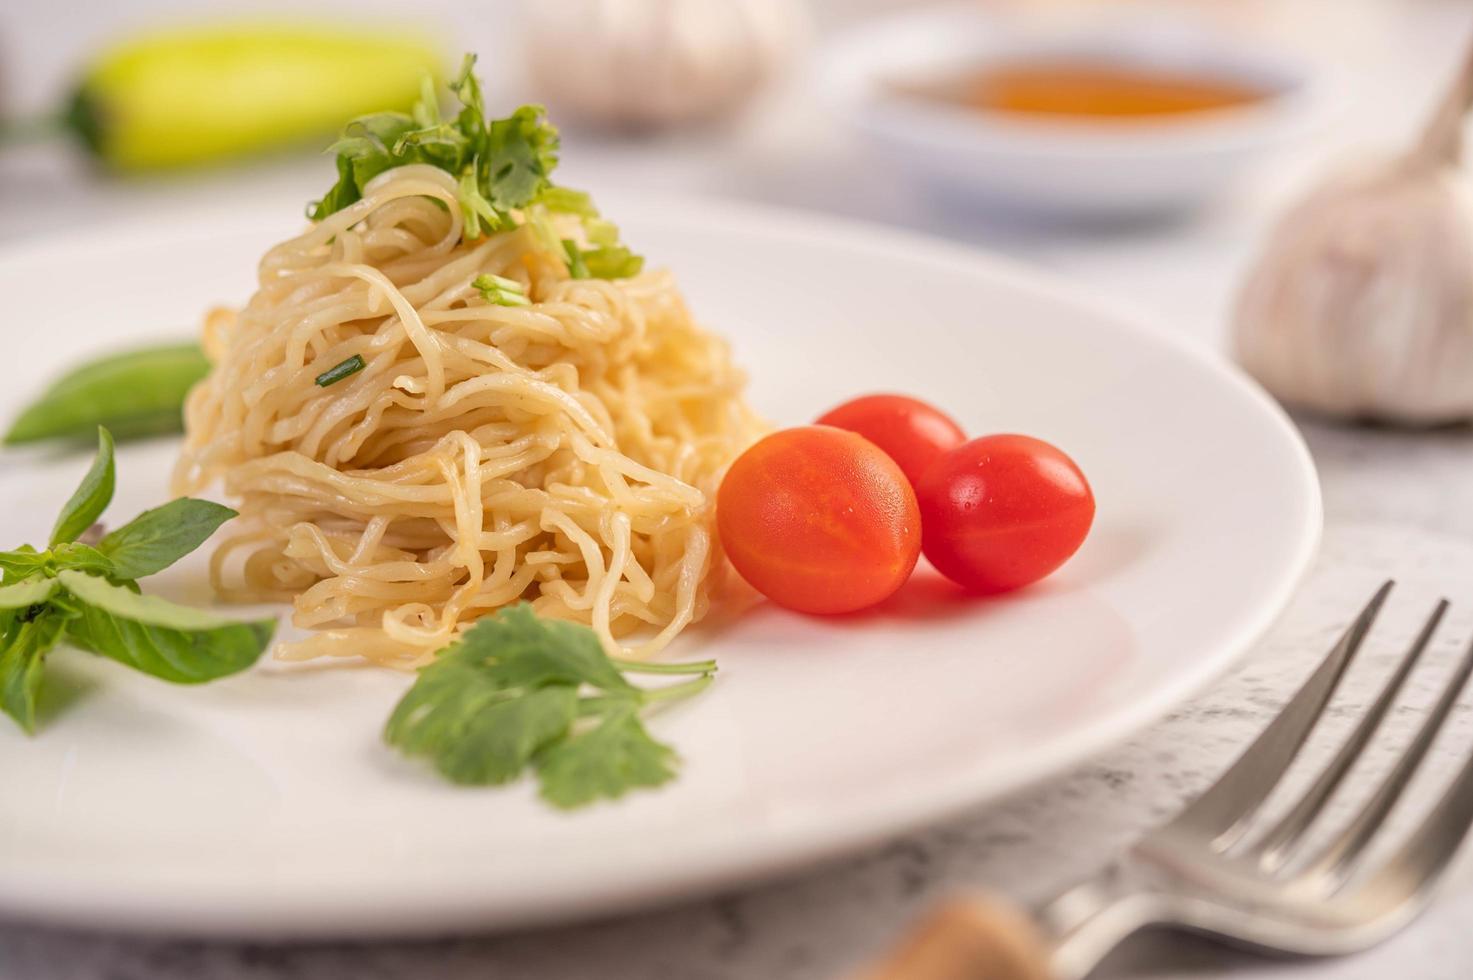 Spaghetti with tomatoes, coriander and basil photo